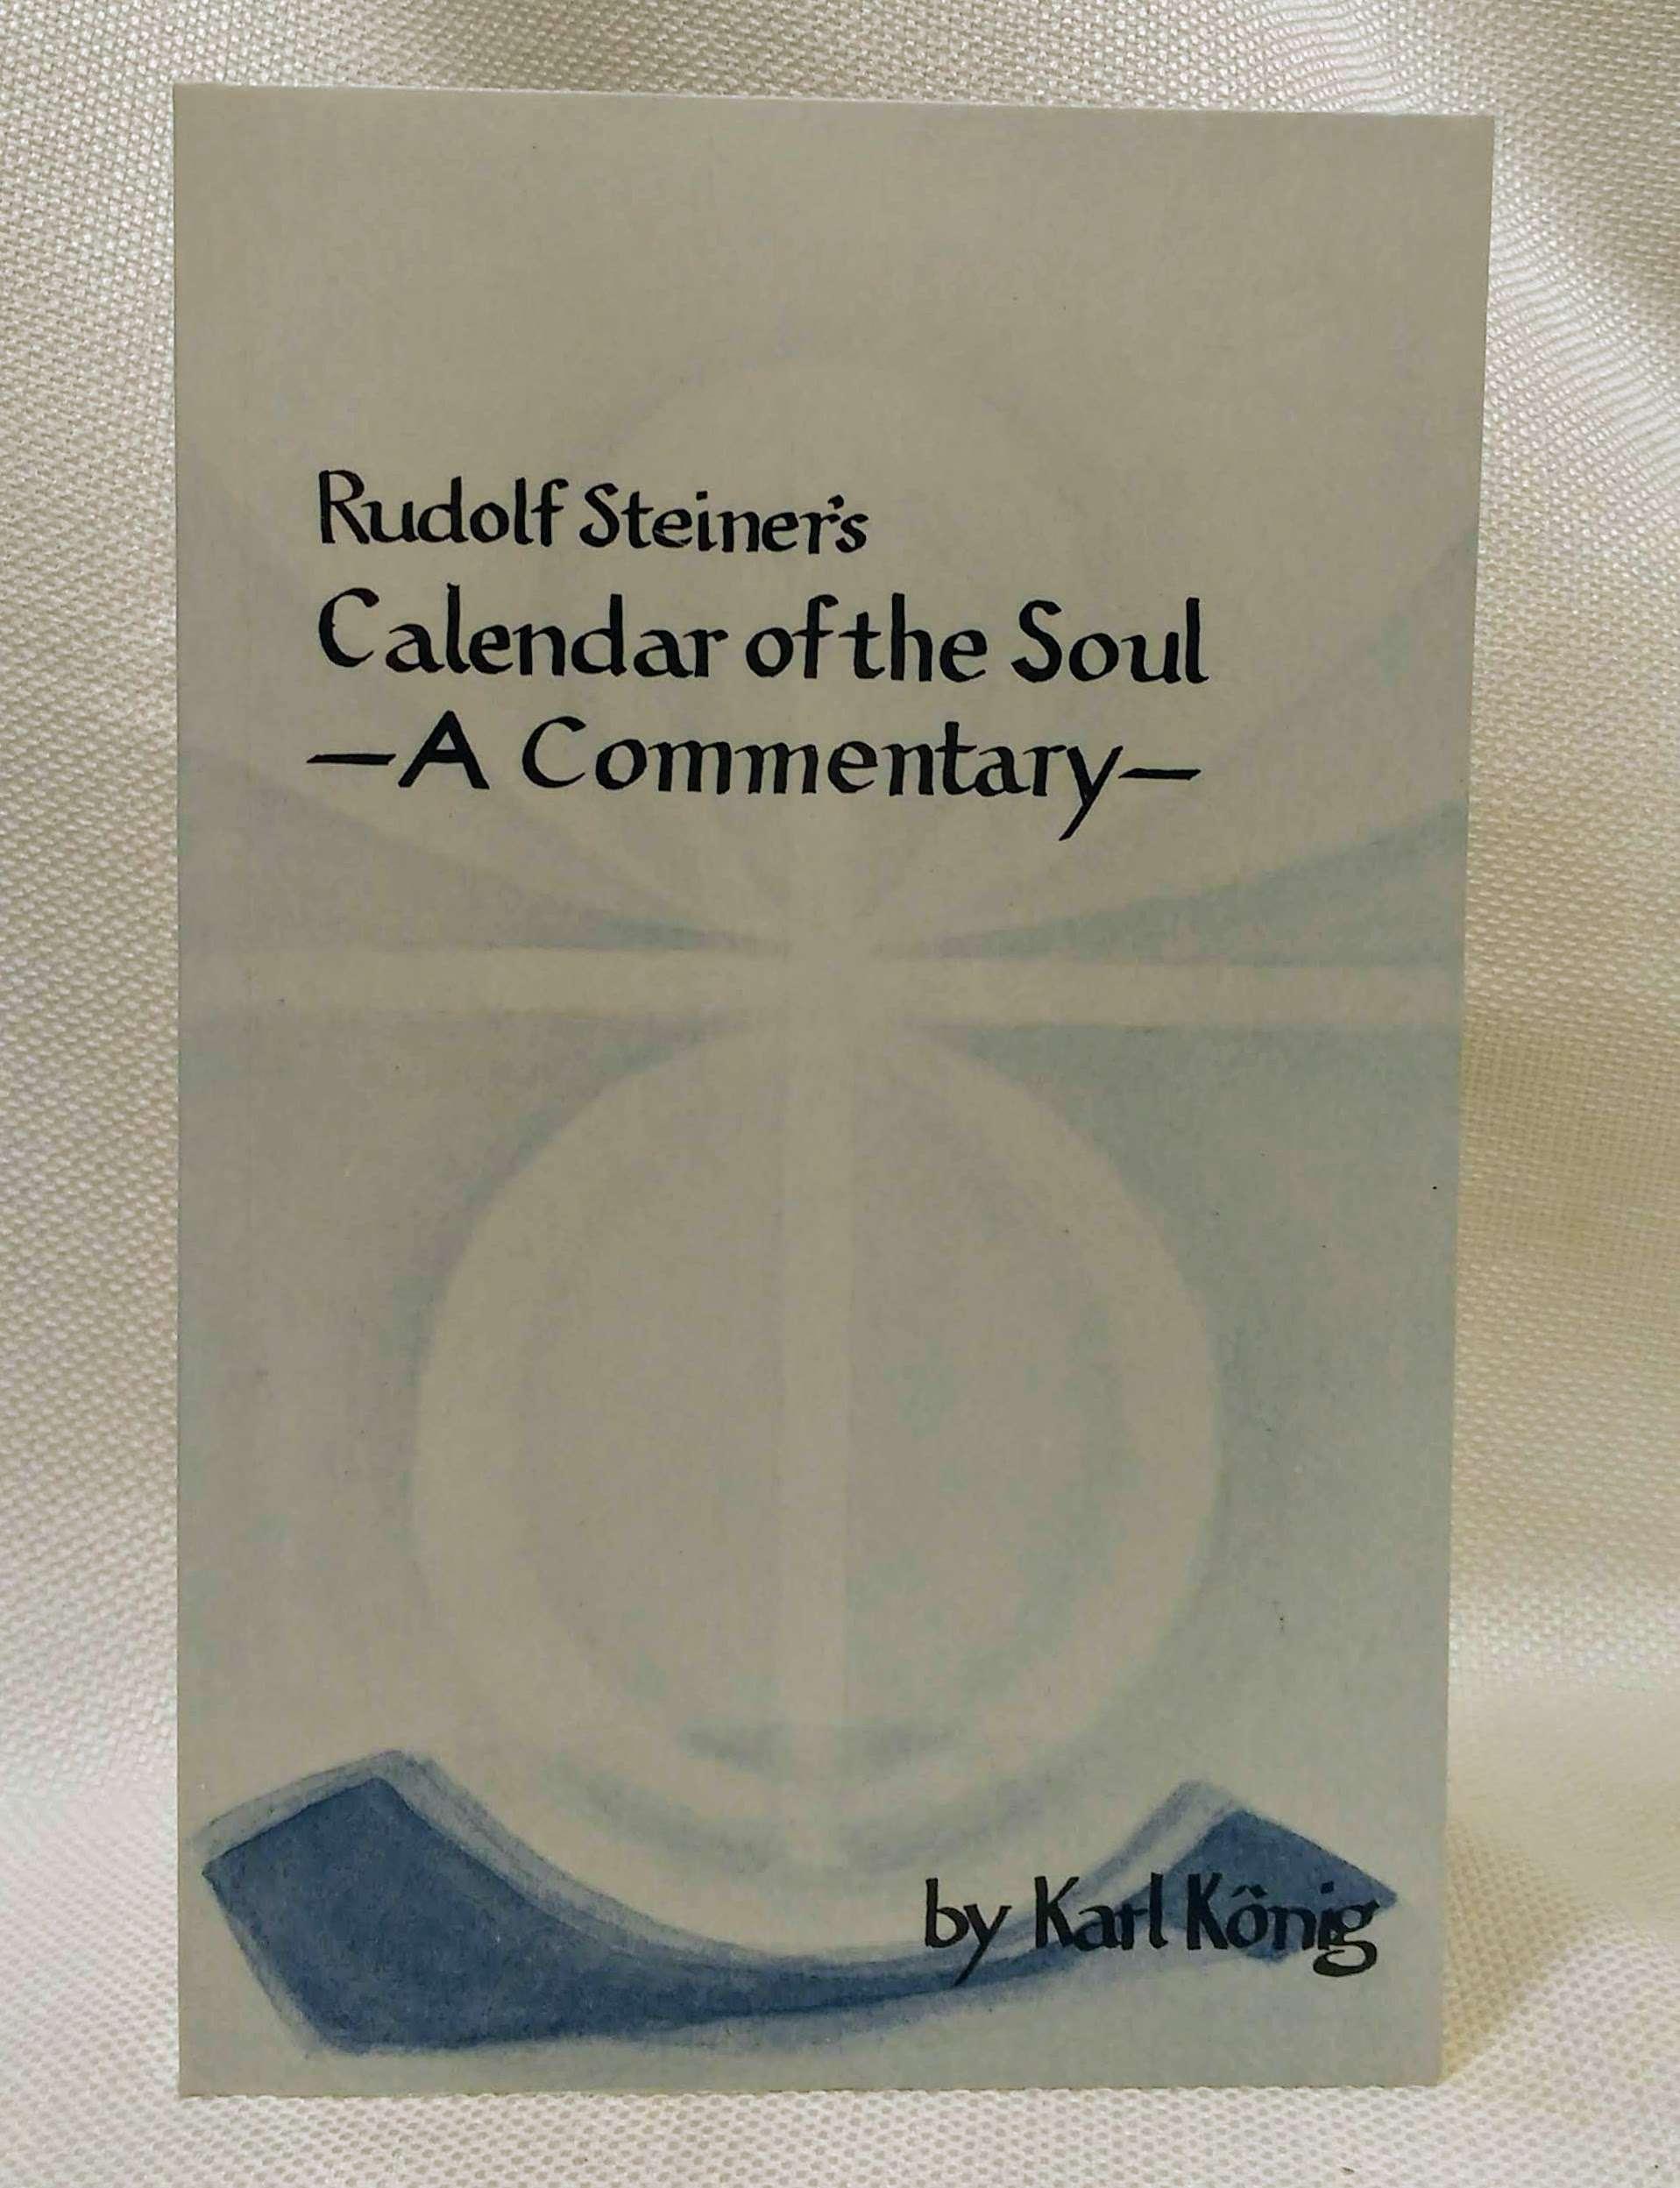 Rudolf Steiner's Calendar of the Soul, Konig, Karl; Koenig, Karl